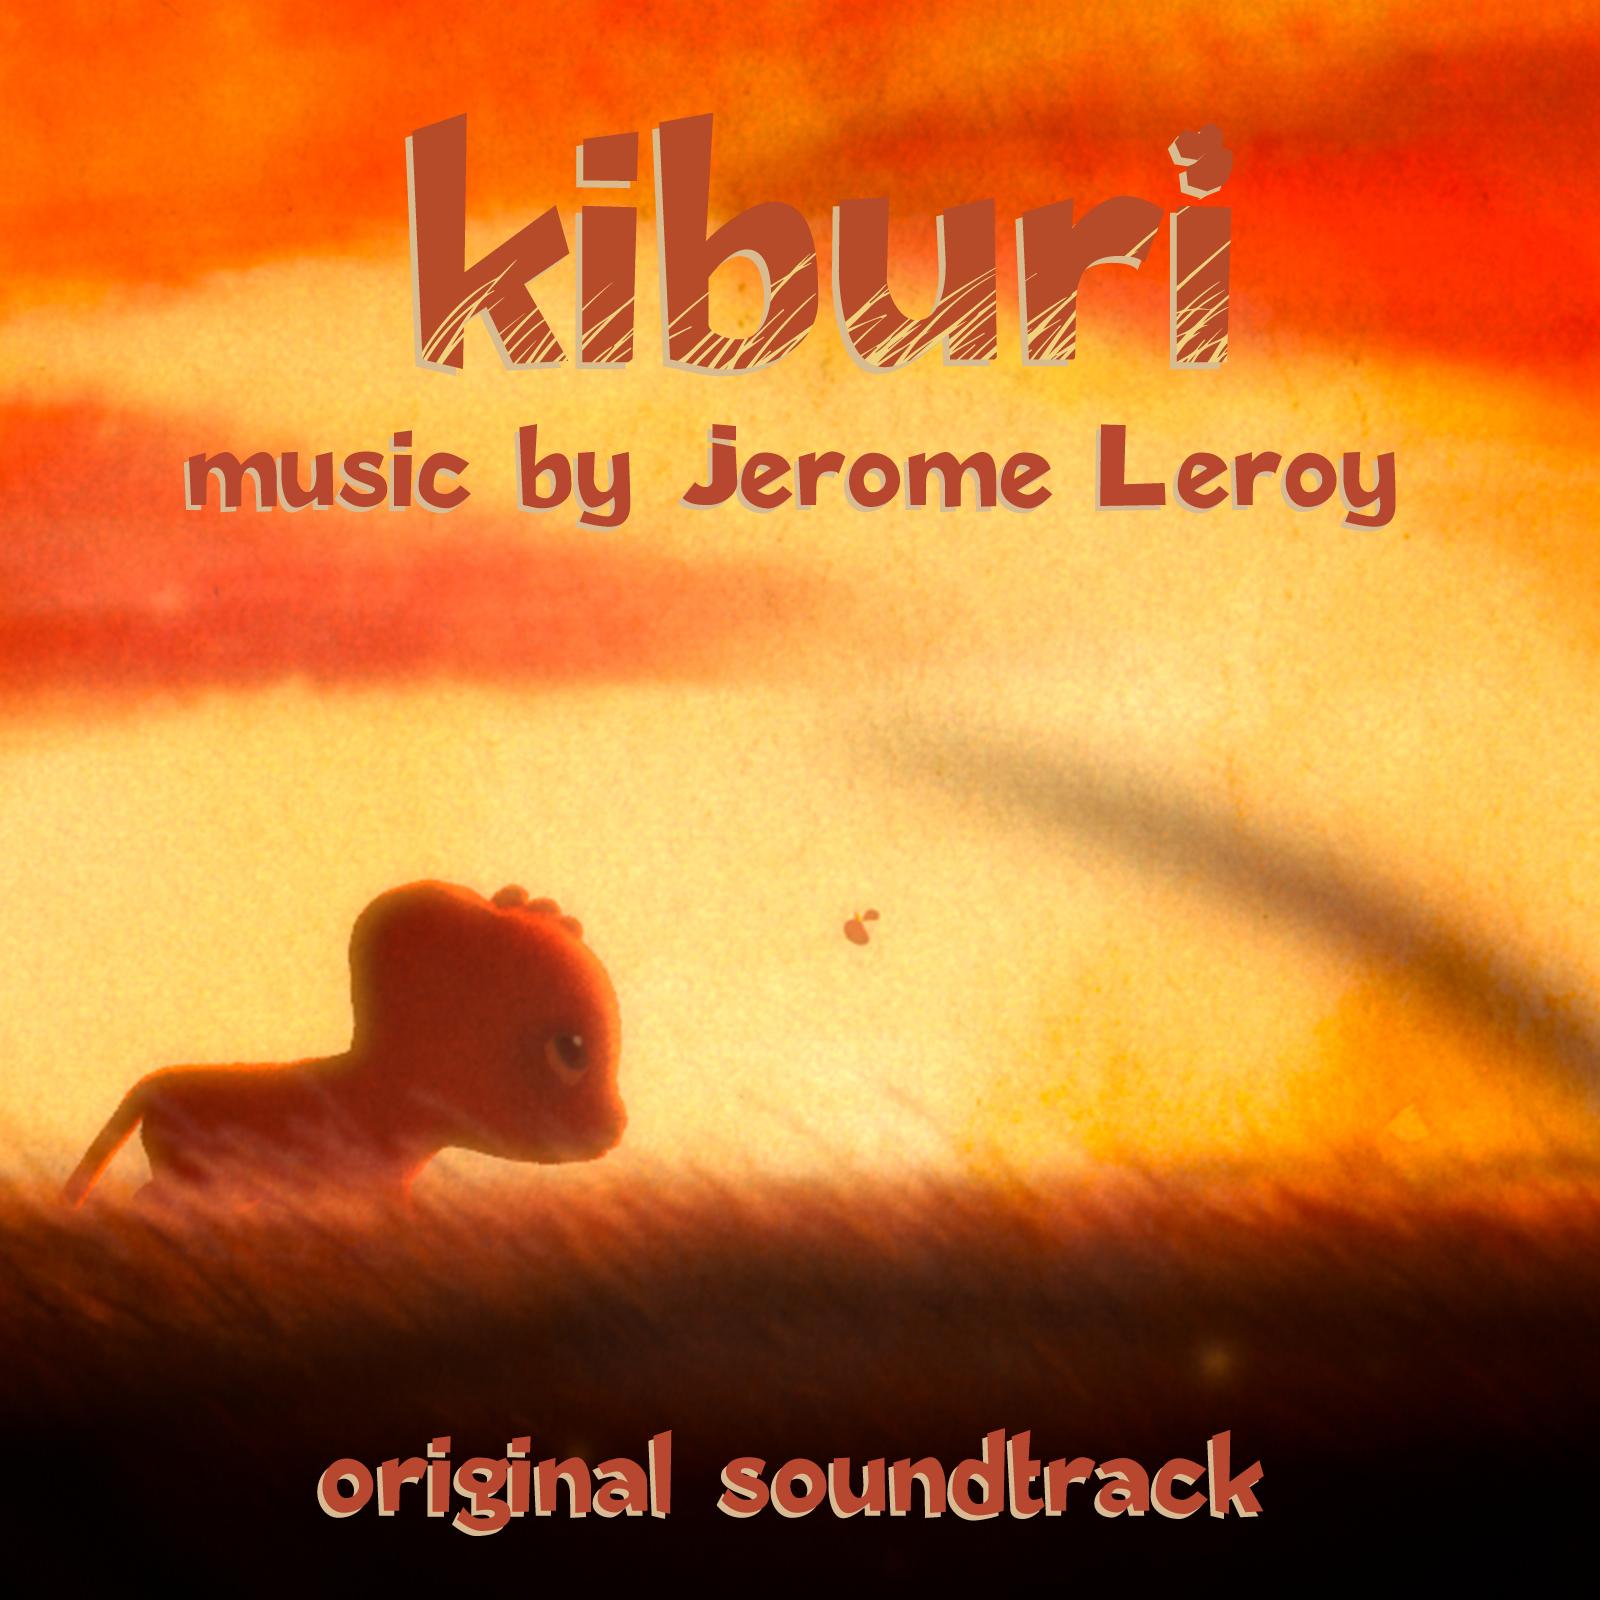 Kiburi - Original Soundtrack (Cover Art) 1600px.jpg